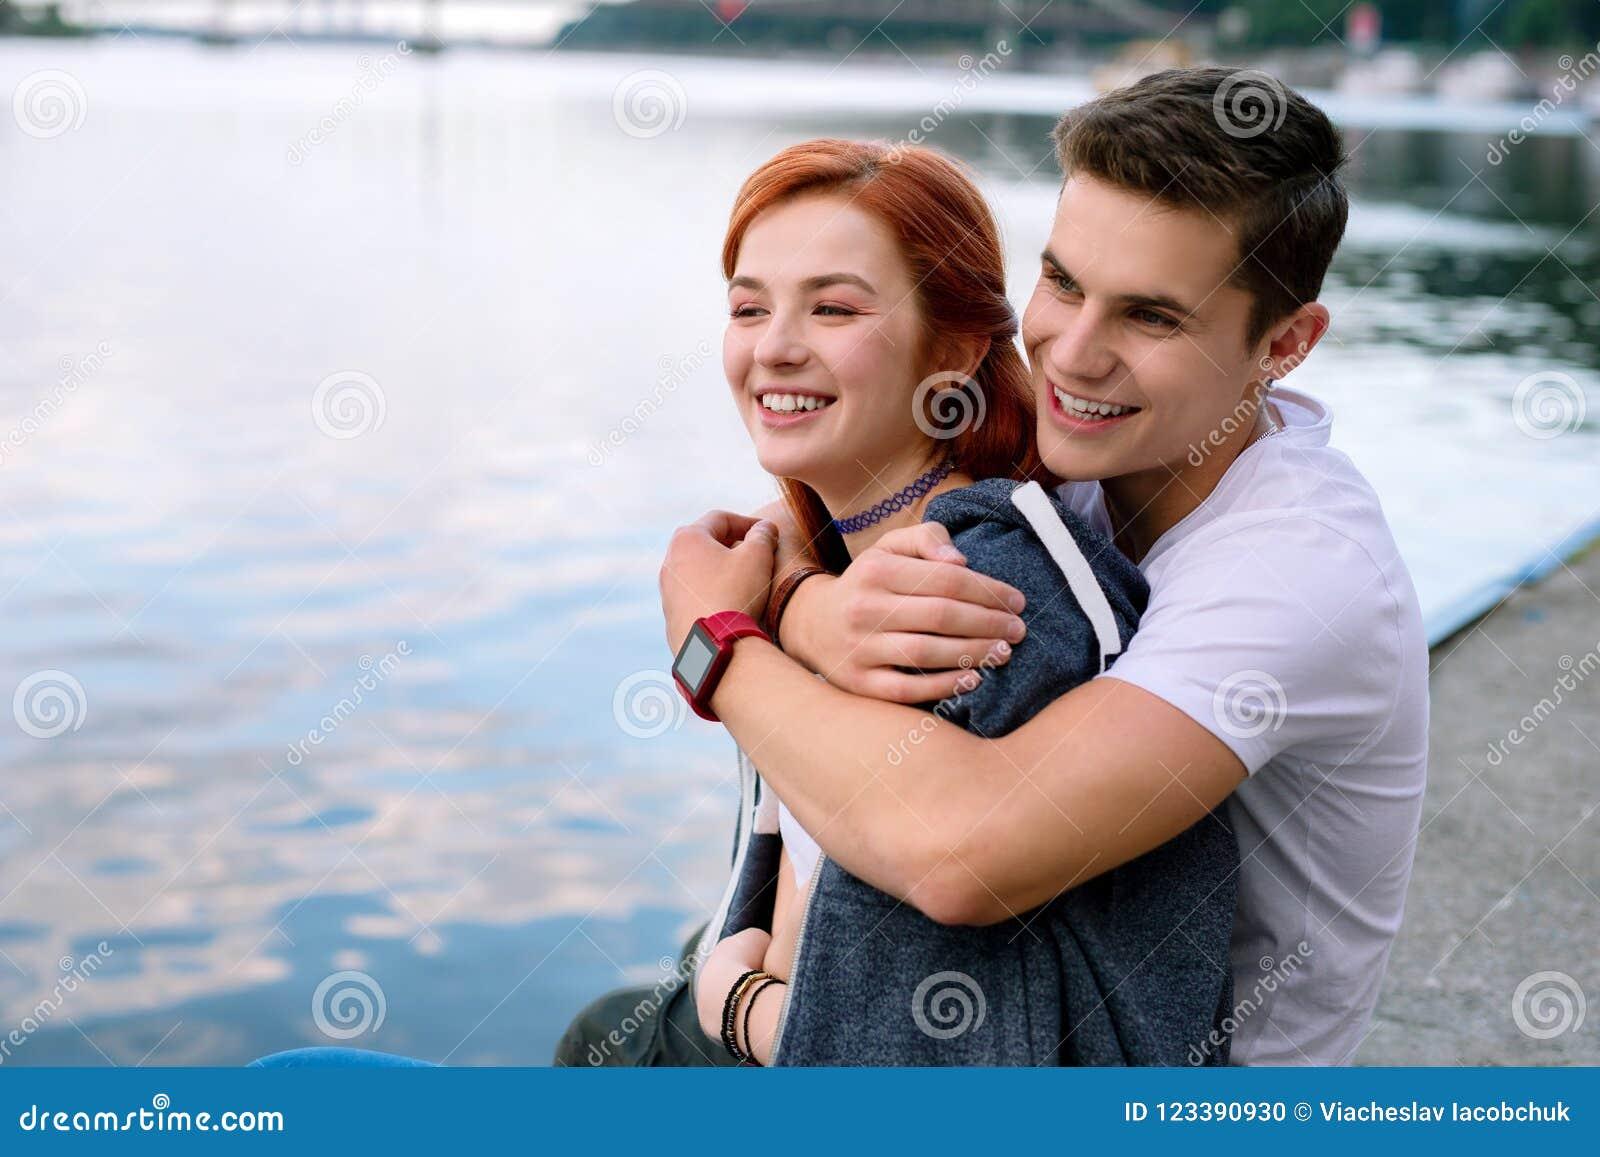 igen dating dating healthy girl